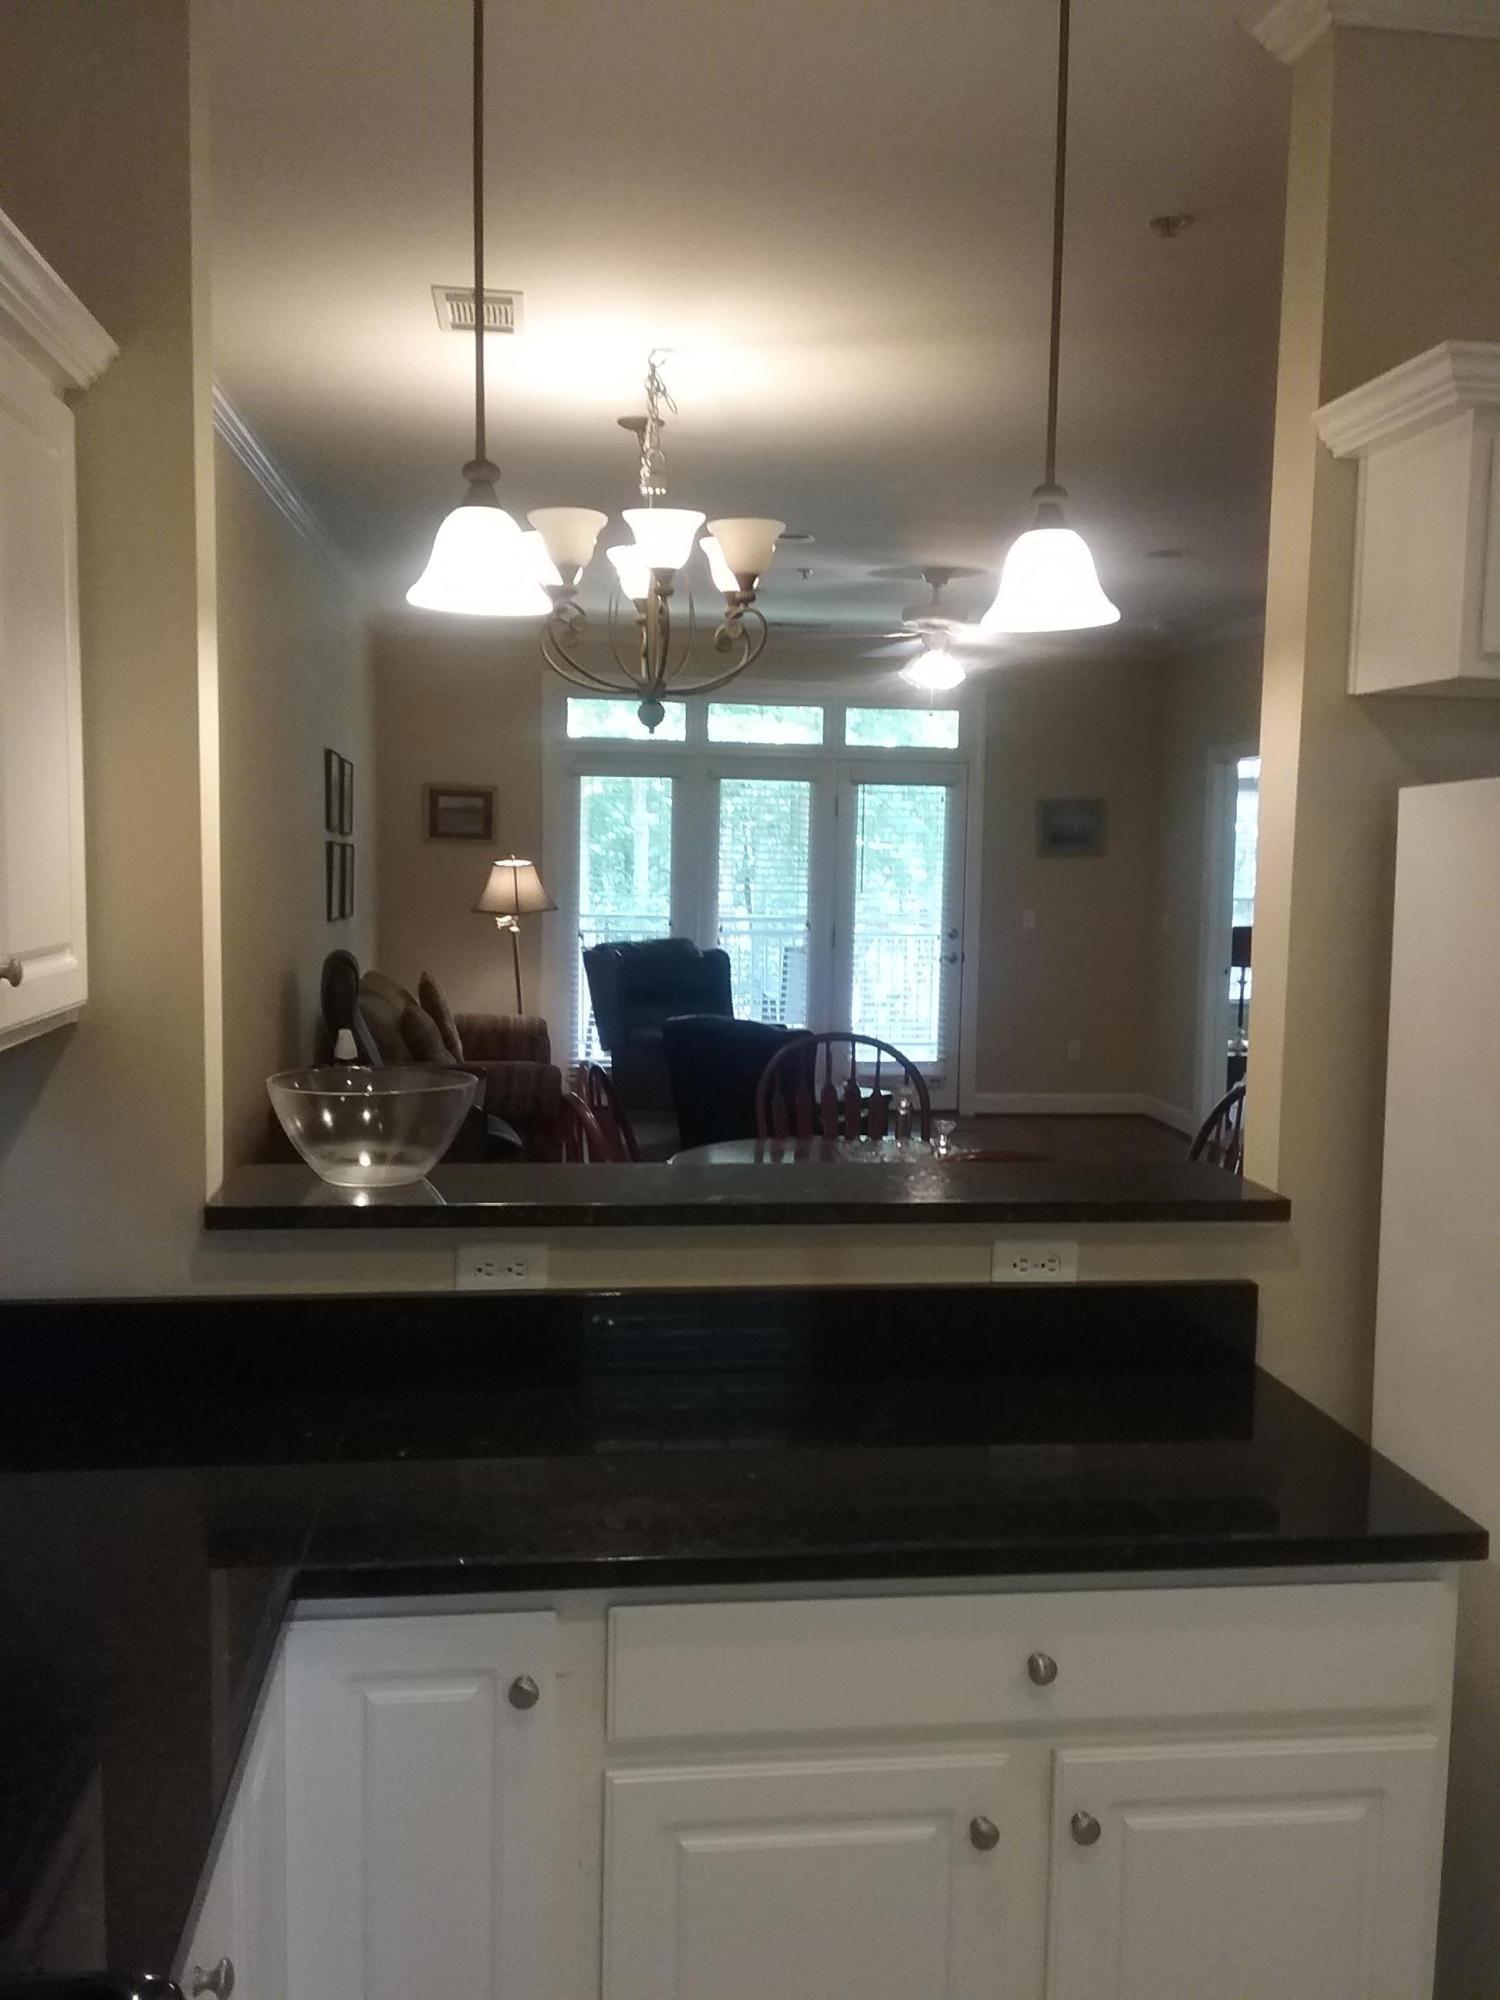 Ballards Pointe II Homes For Sale - 103 Ballard, Santee, SC - 6